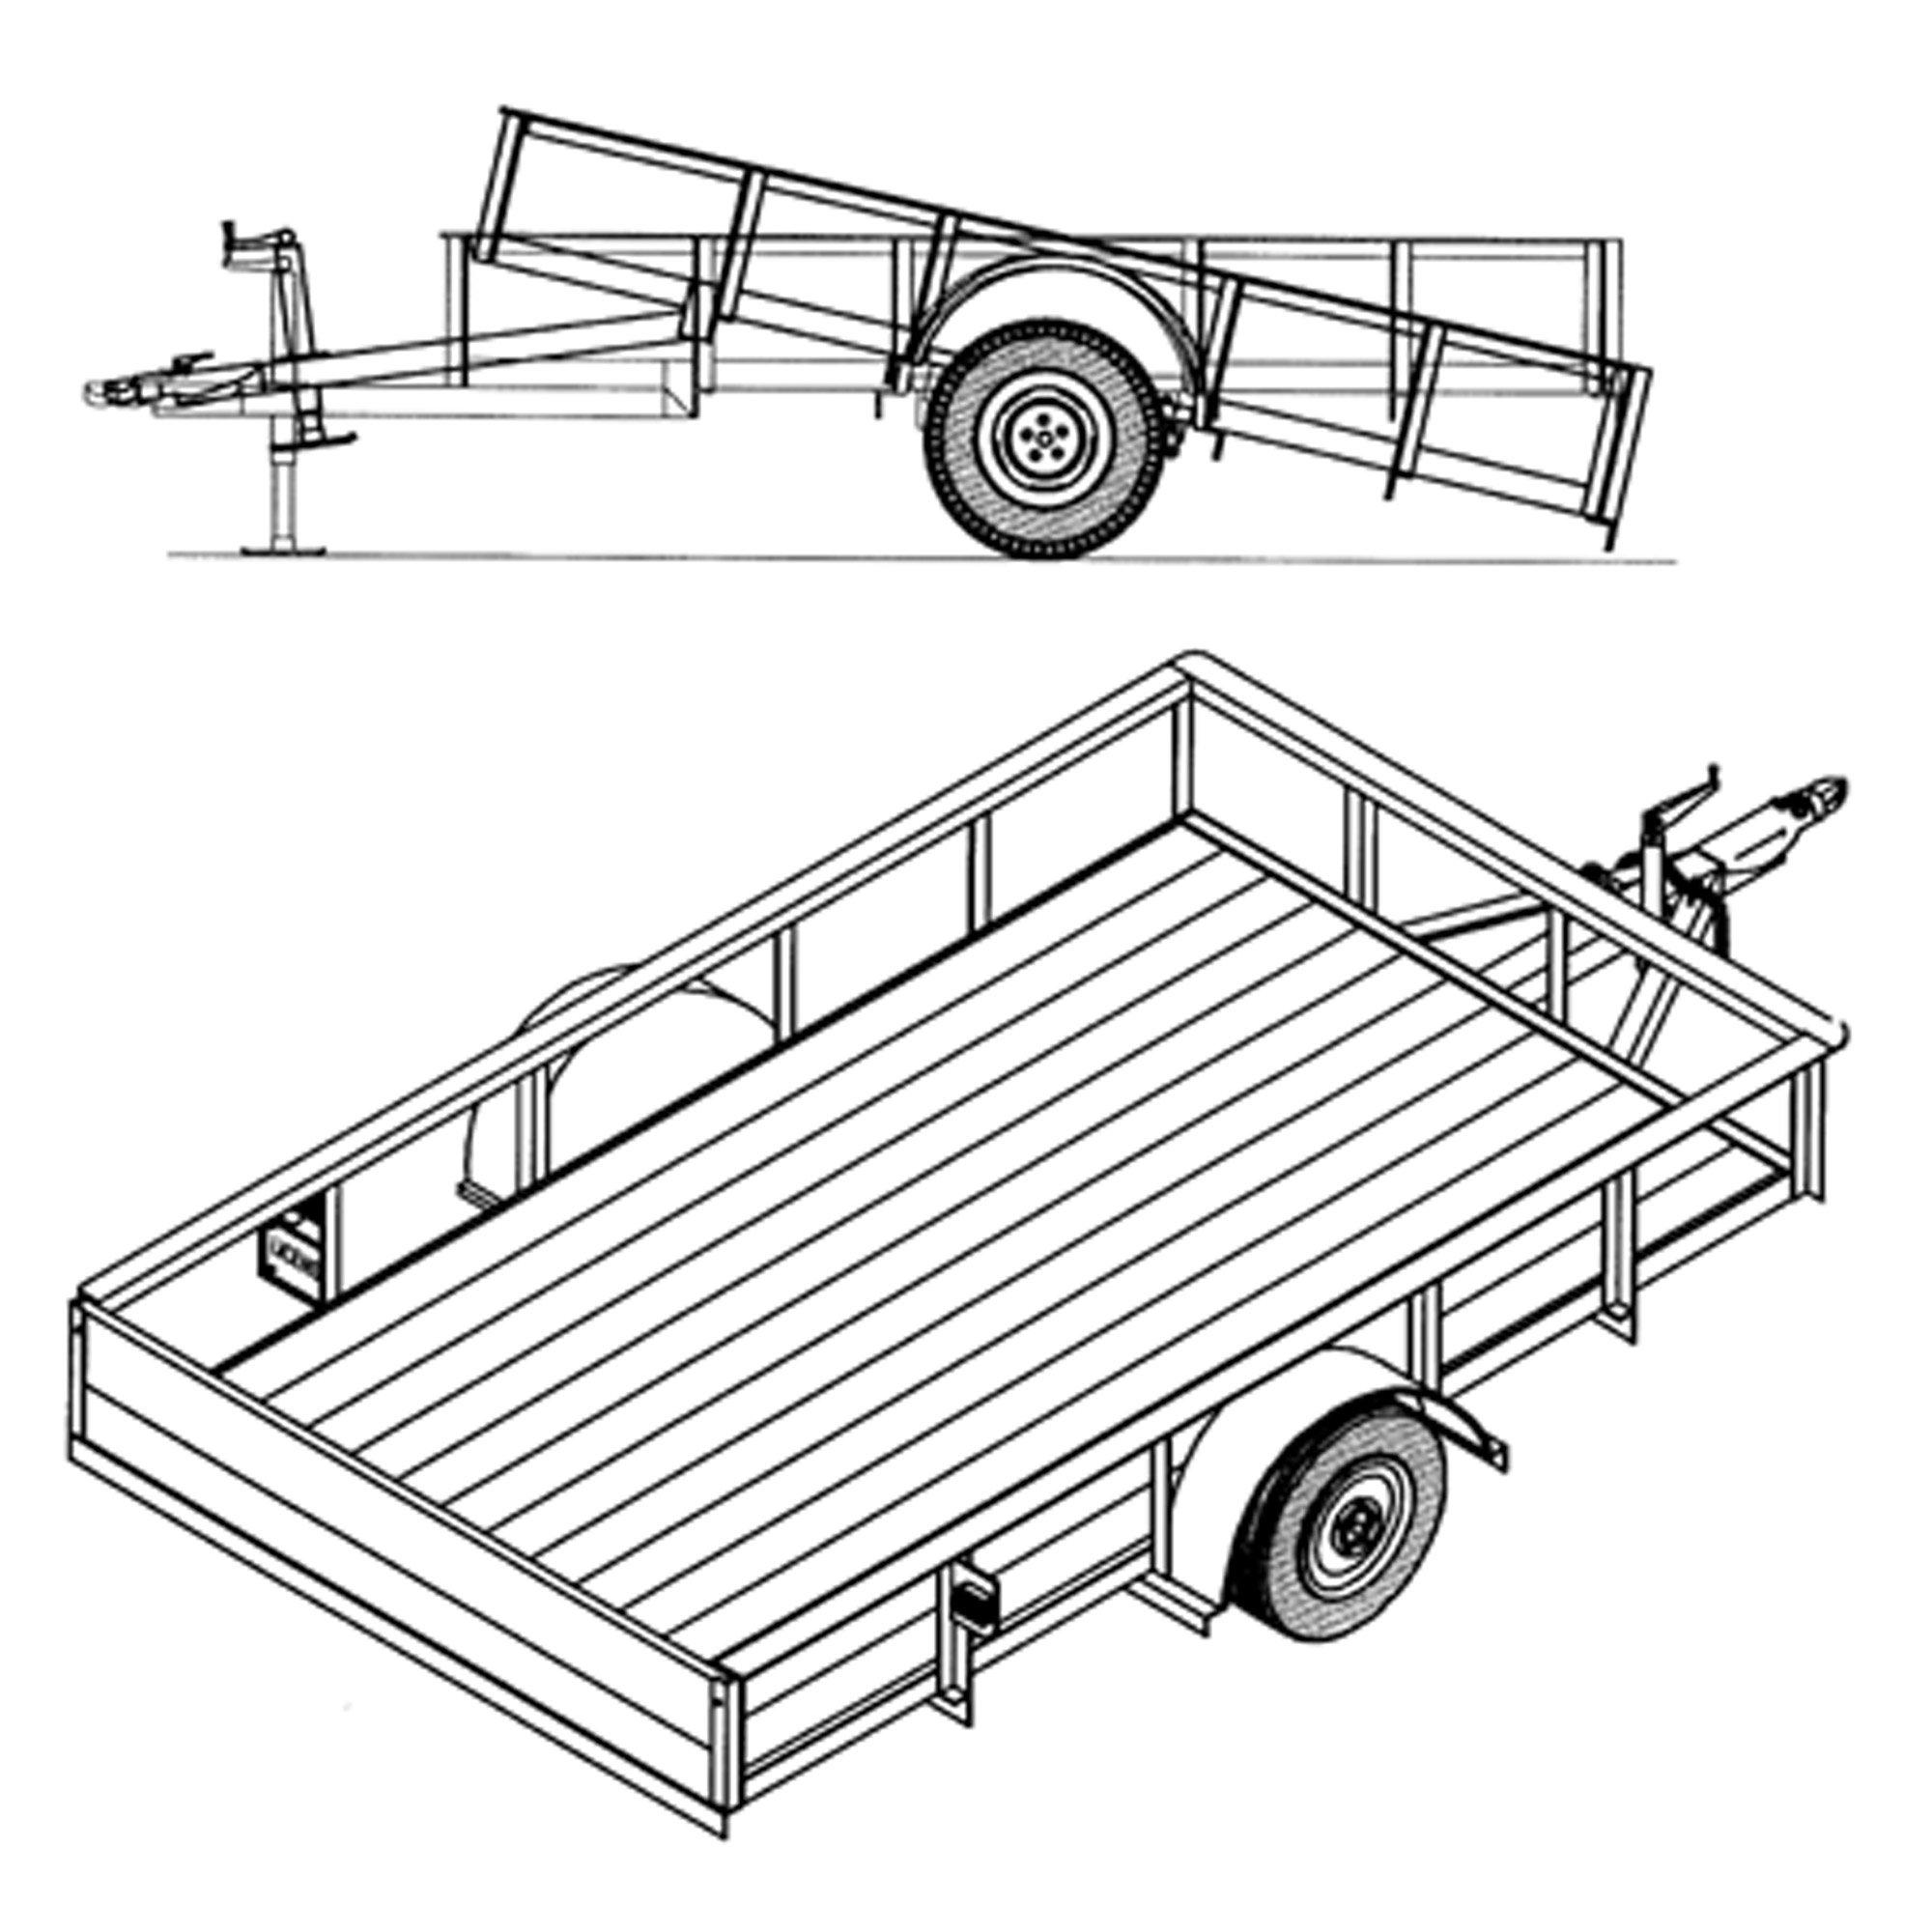 Cheap tilt equipment trailer find tilt equipment trailer deals on get quotations 6 4 x 10 utility tilt trailer plans blueprints malvernweather Images